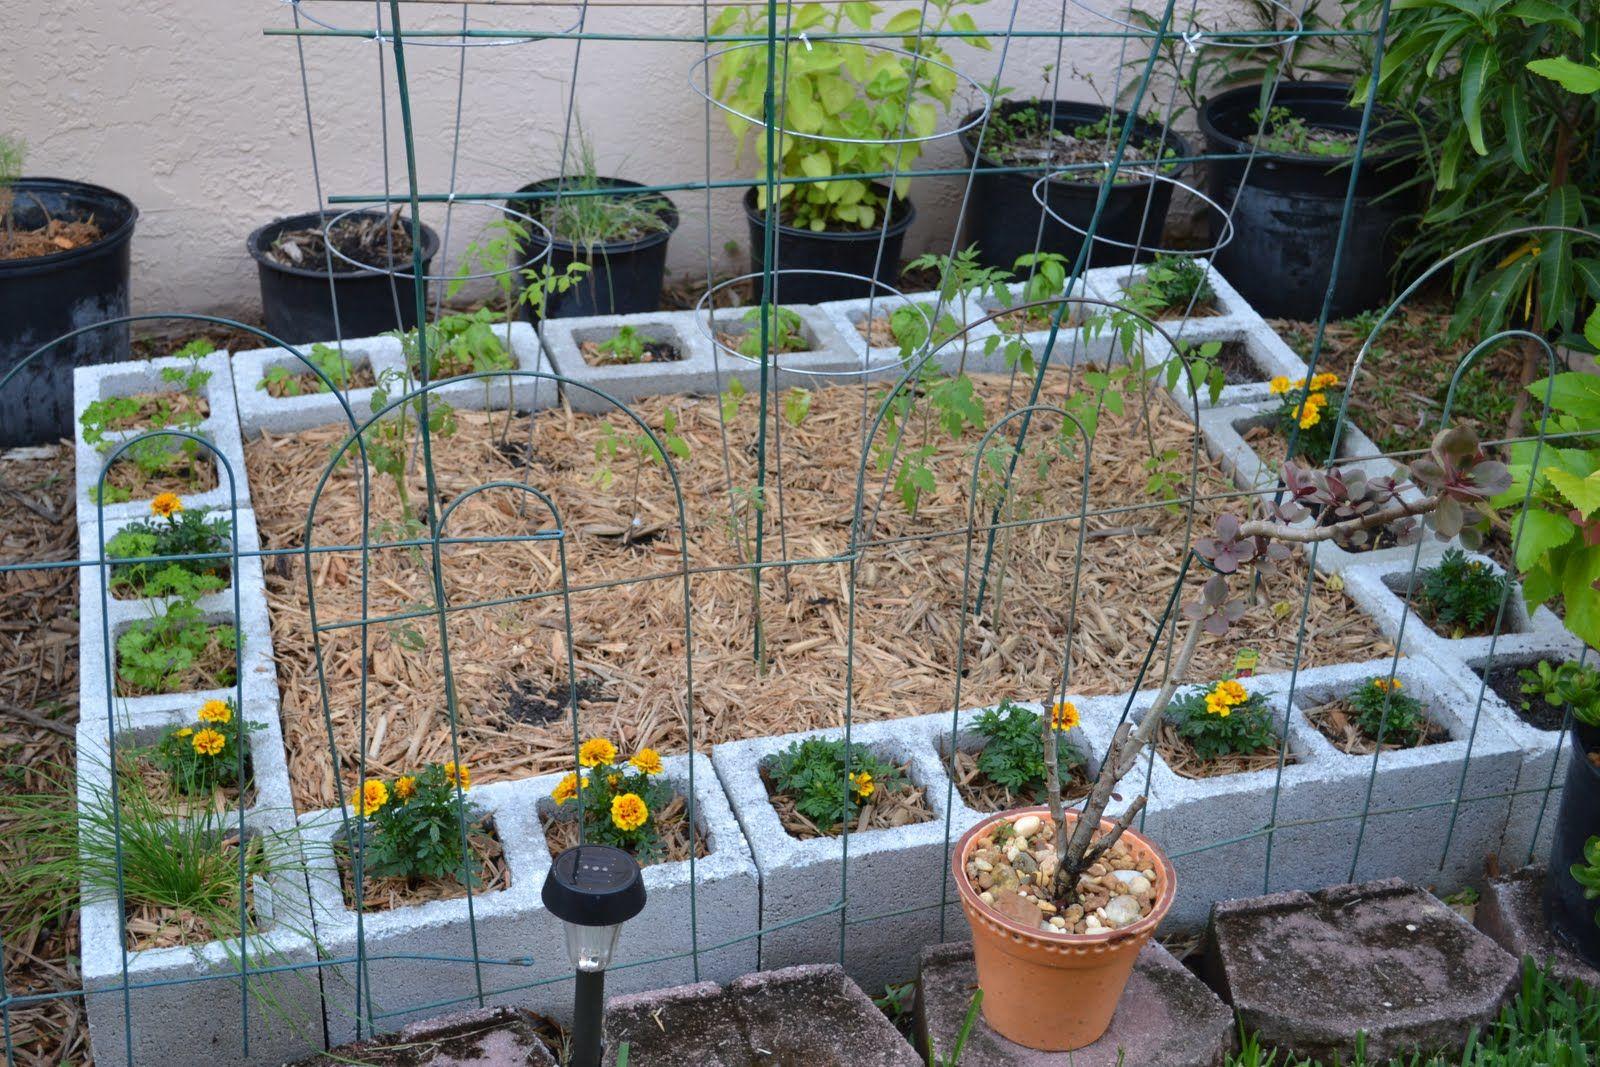 Diy cinder block raised garden bed spray paint the cinder block for more color jardiner a for Painting cinder blocks for garden